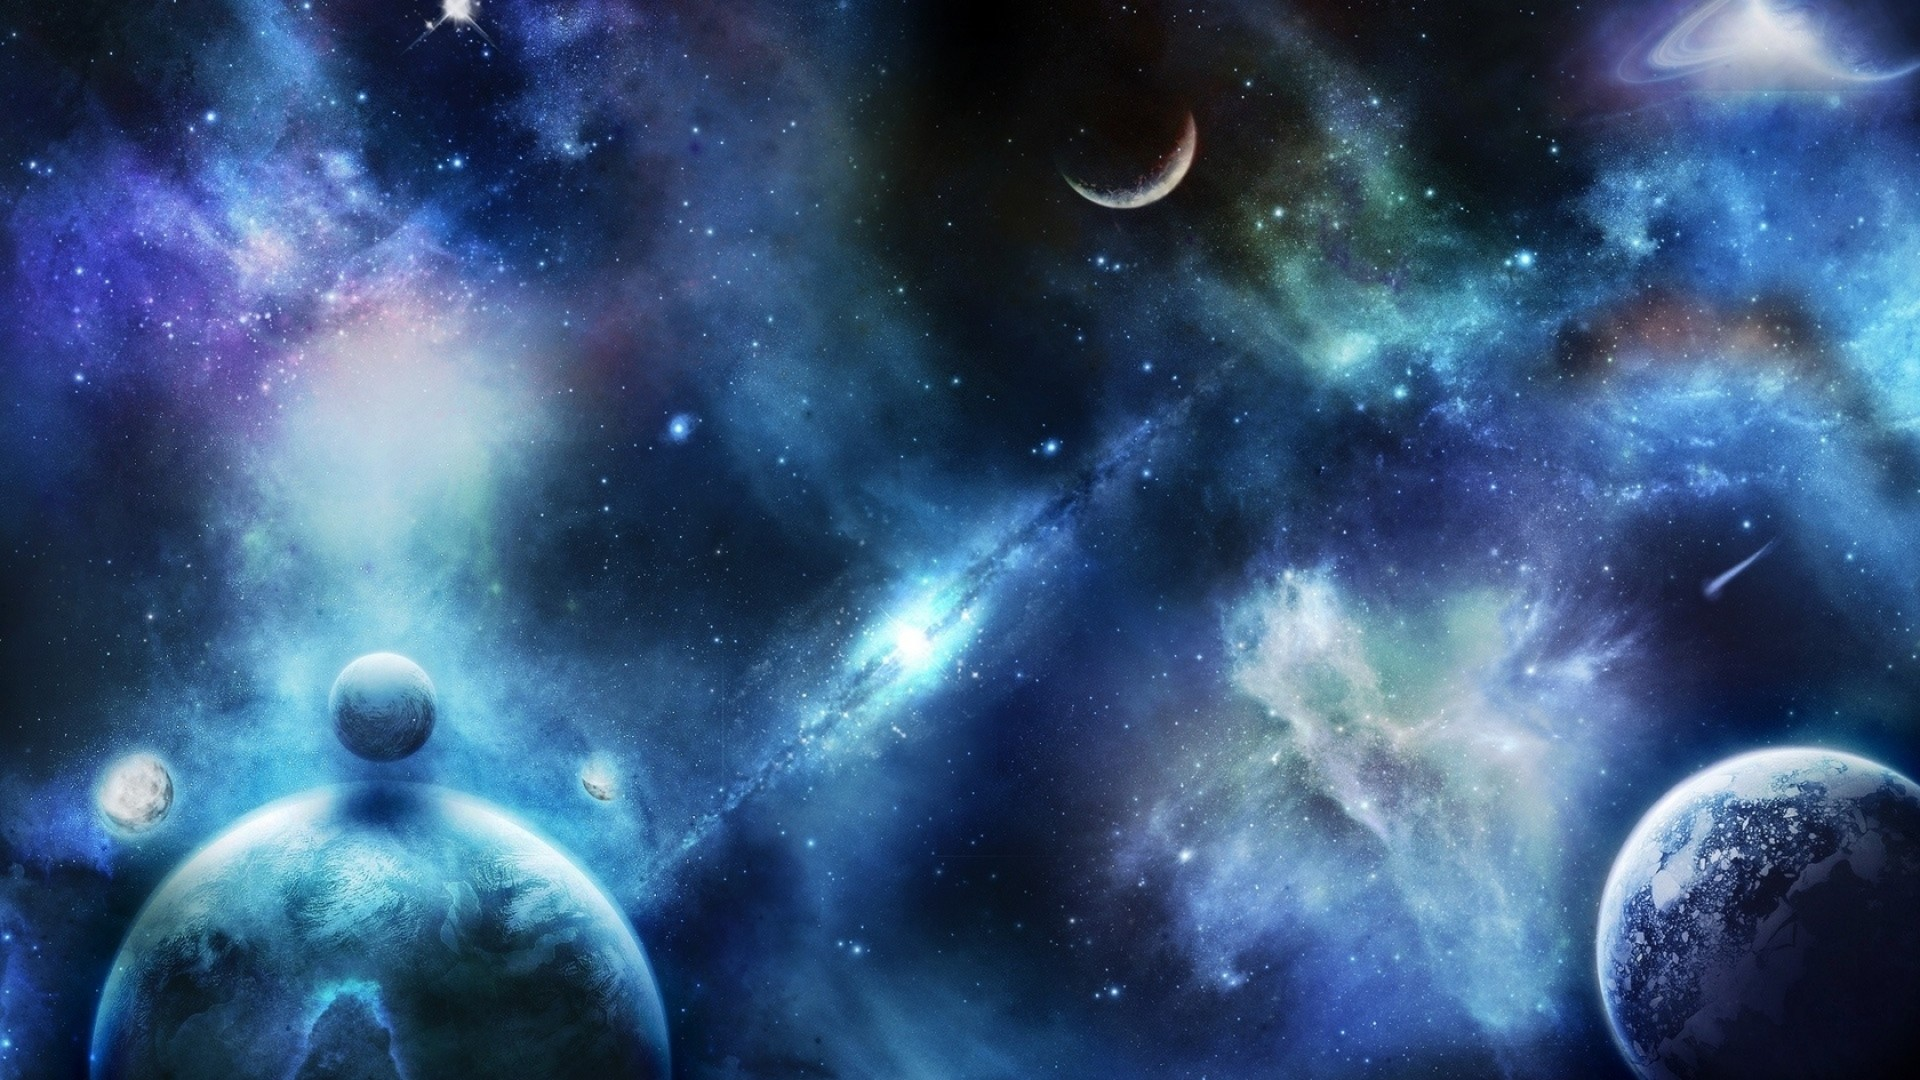 Wallpaper planets, stars, space, universe, spots, blurring